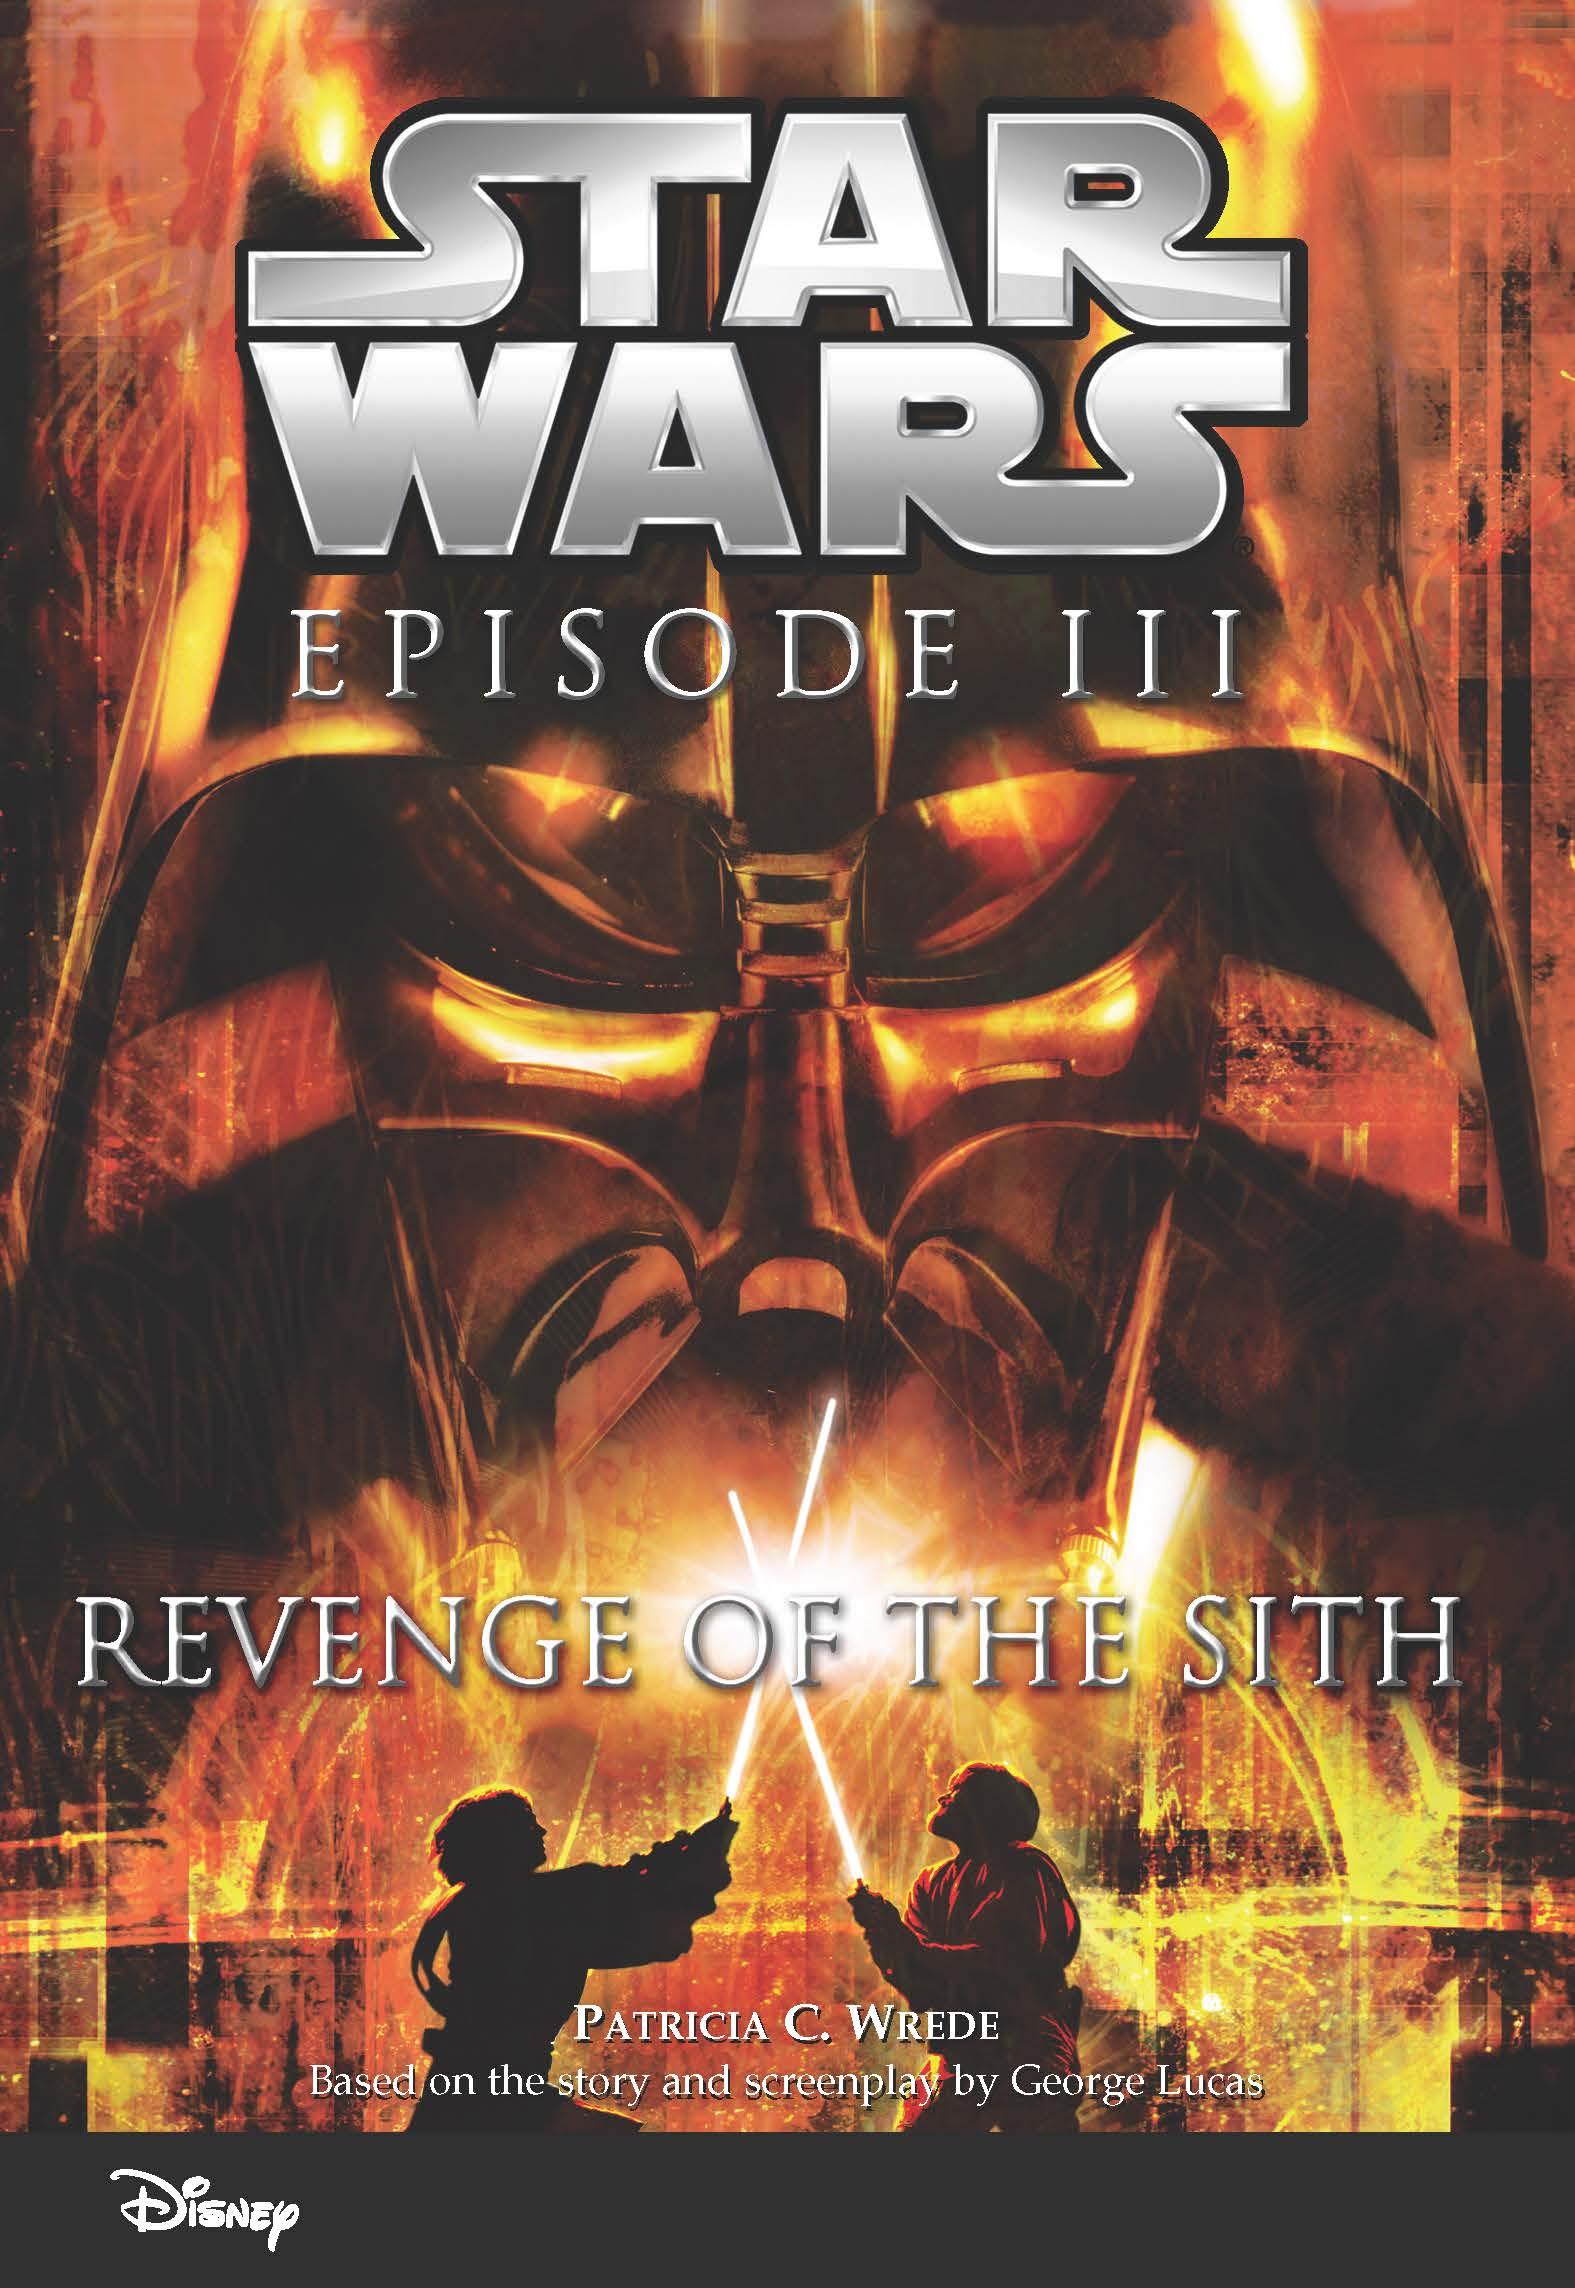 Art Art Posters Star Wars Episode Iii Poster Revenge Of Sith 1 1218 Edita Nc